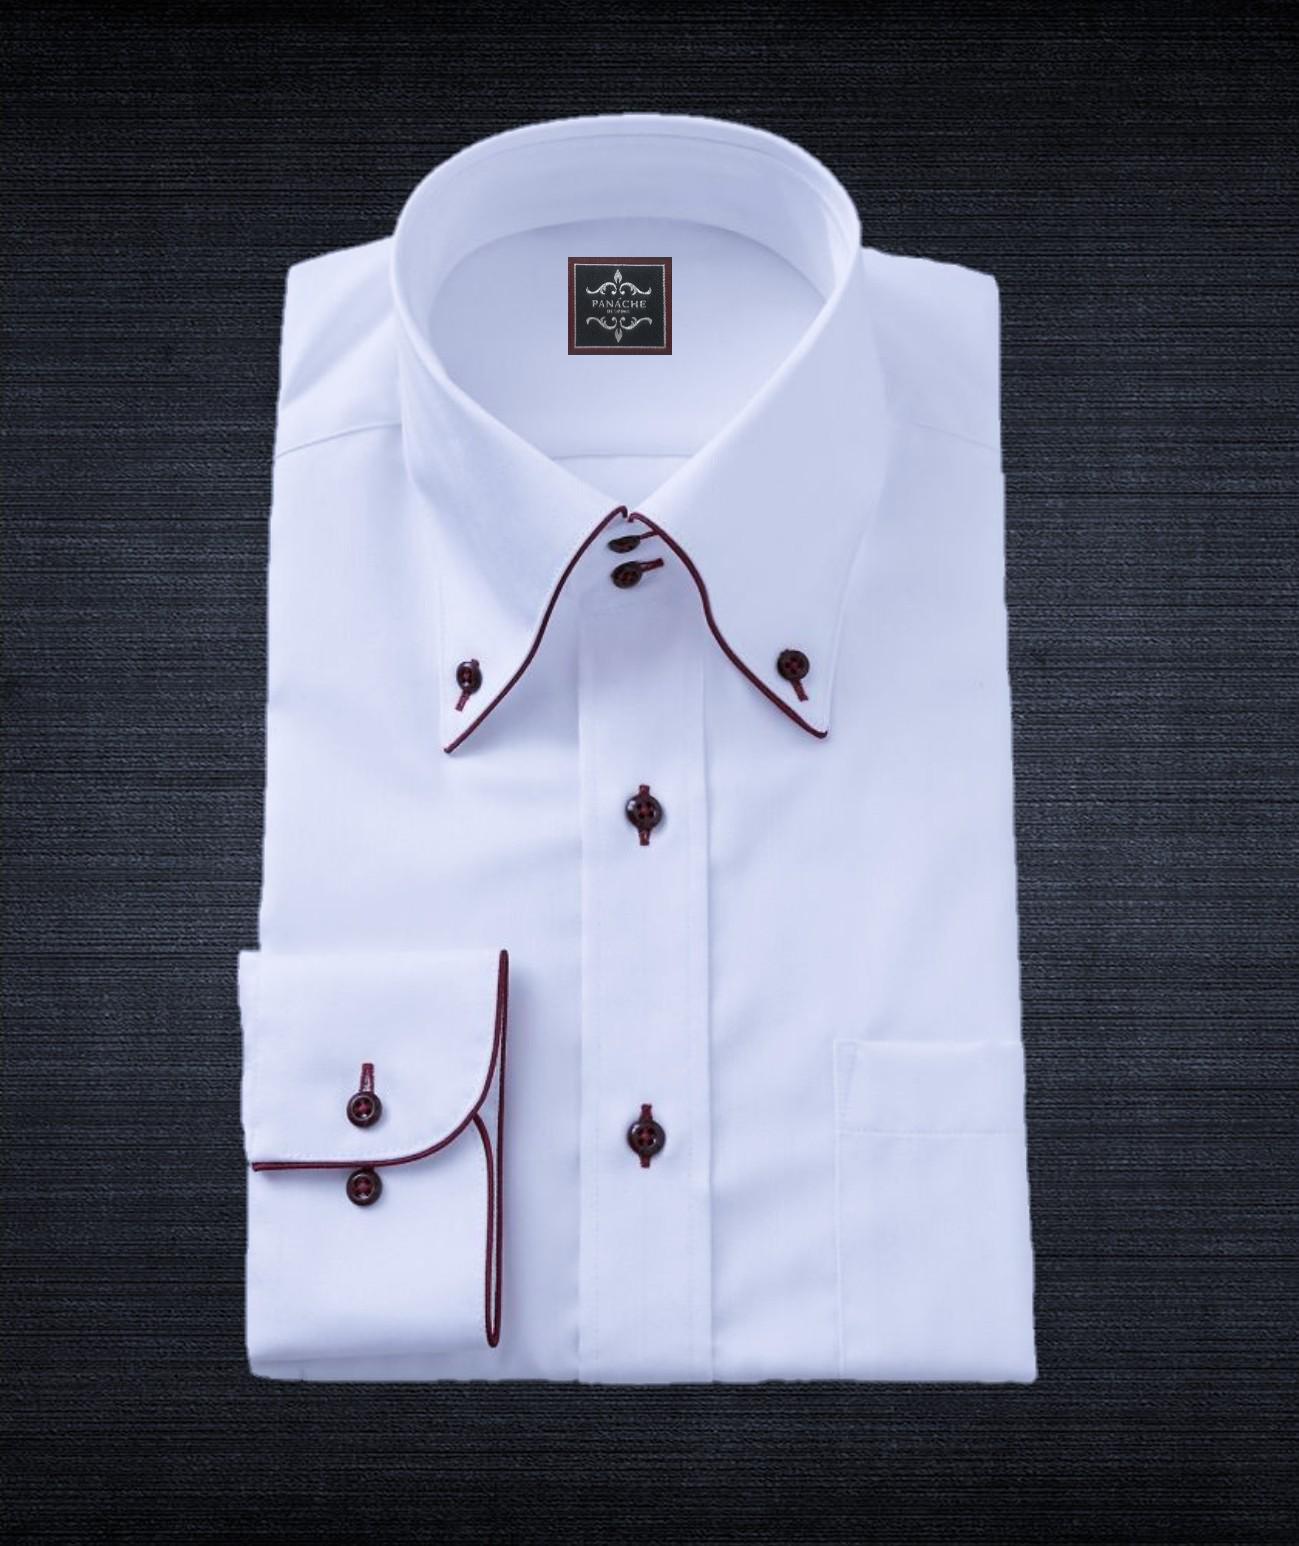 White Broadcloth Shirt Button Down Big Collar Panache Bespoke Mens Shirt Dress Shirts Custom Dress Shirts